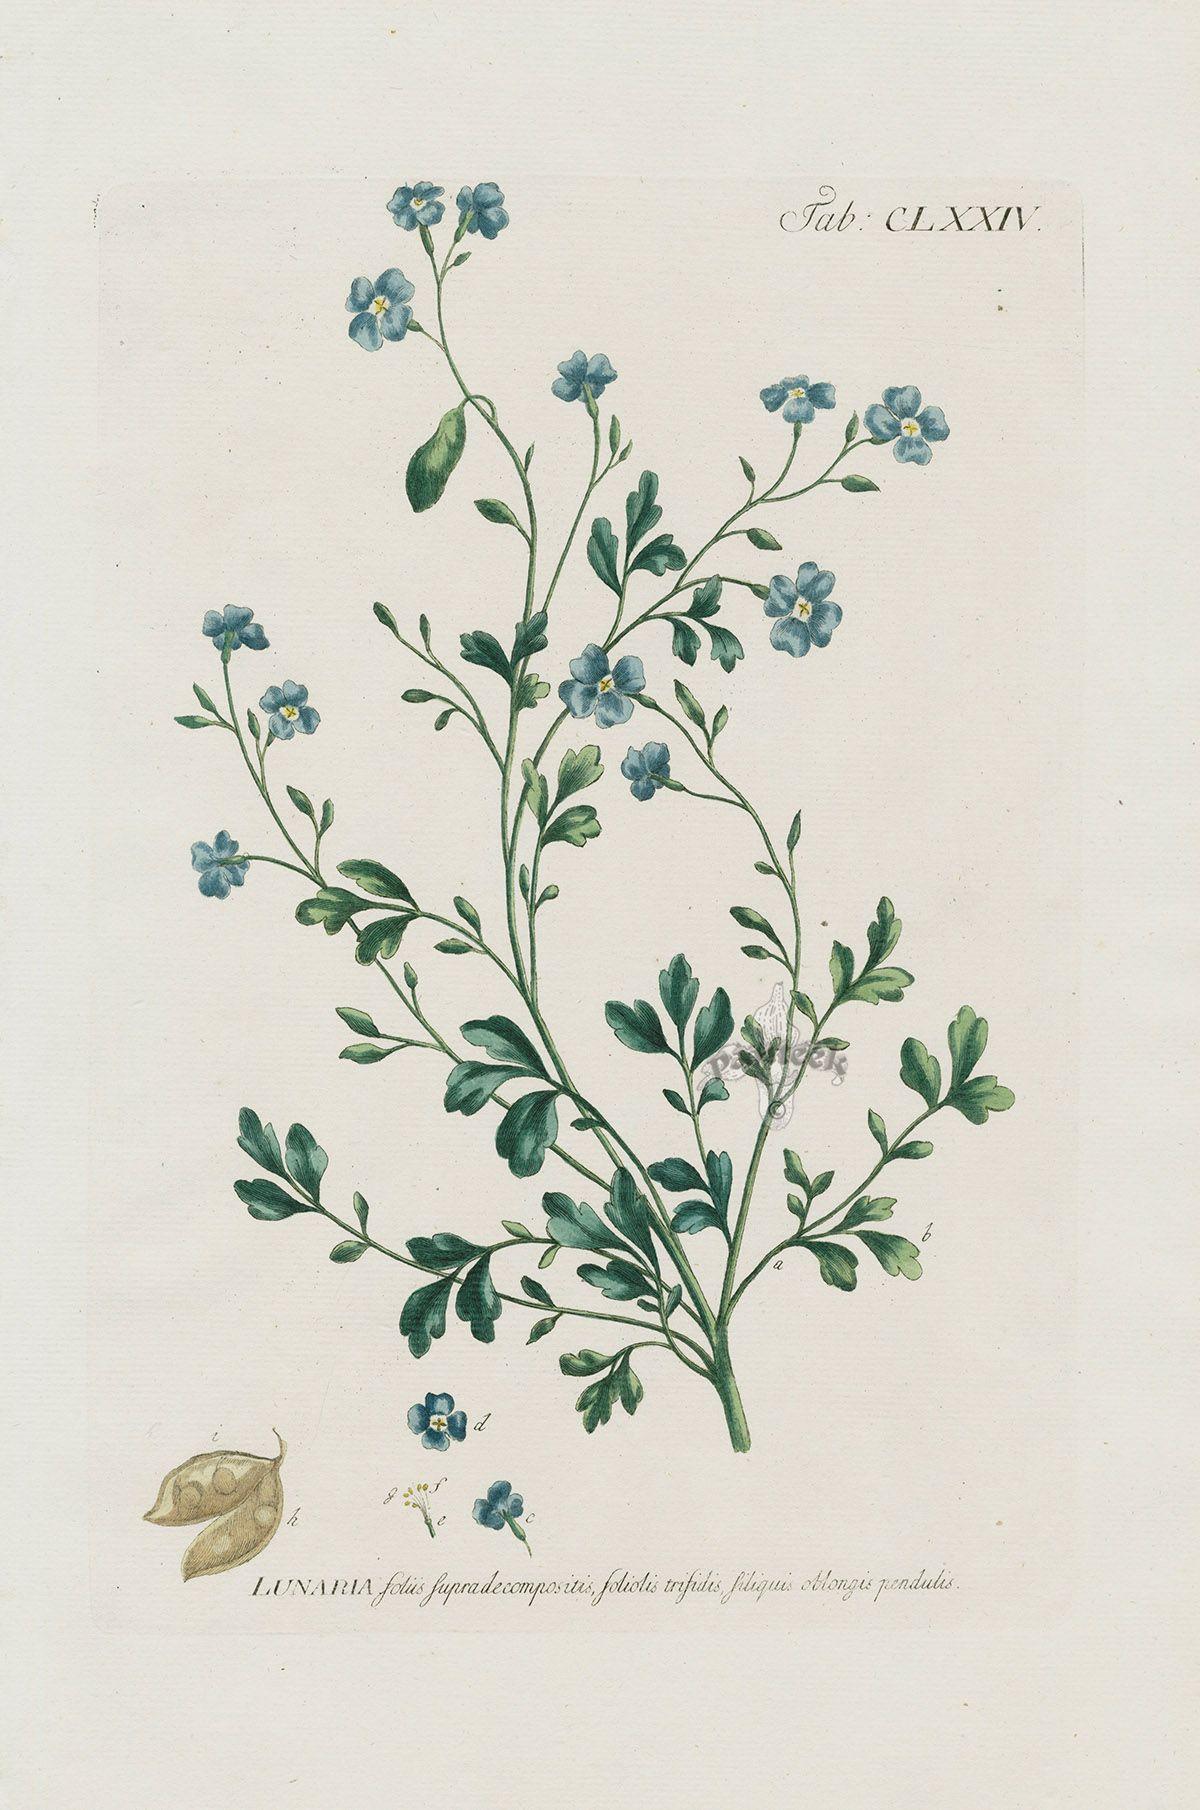 Photo of Lunaria foliis supradecompositis, foliolis trifidis, siliquis oblongis pendulis from 1768 Philip Miller Most Beautiful Plants in Gardens Dictionary